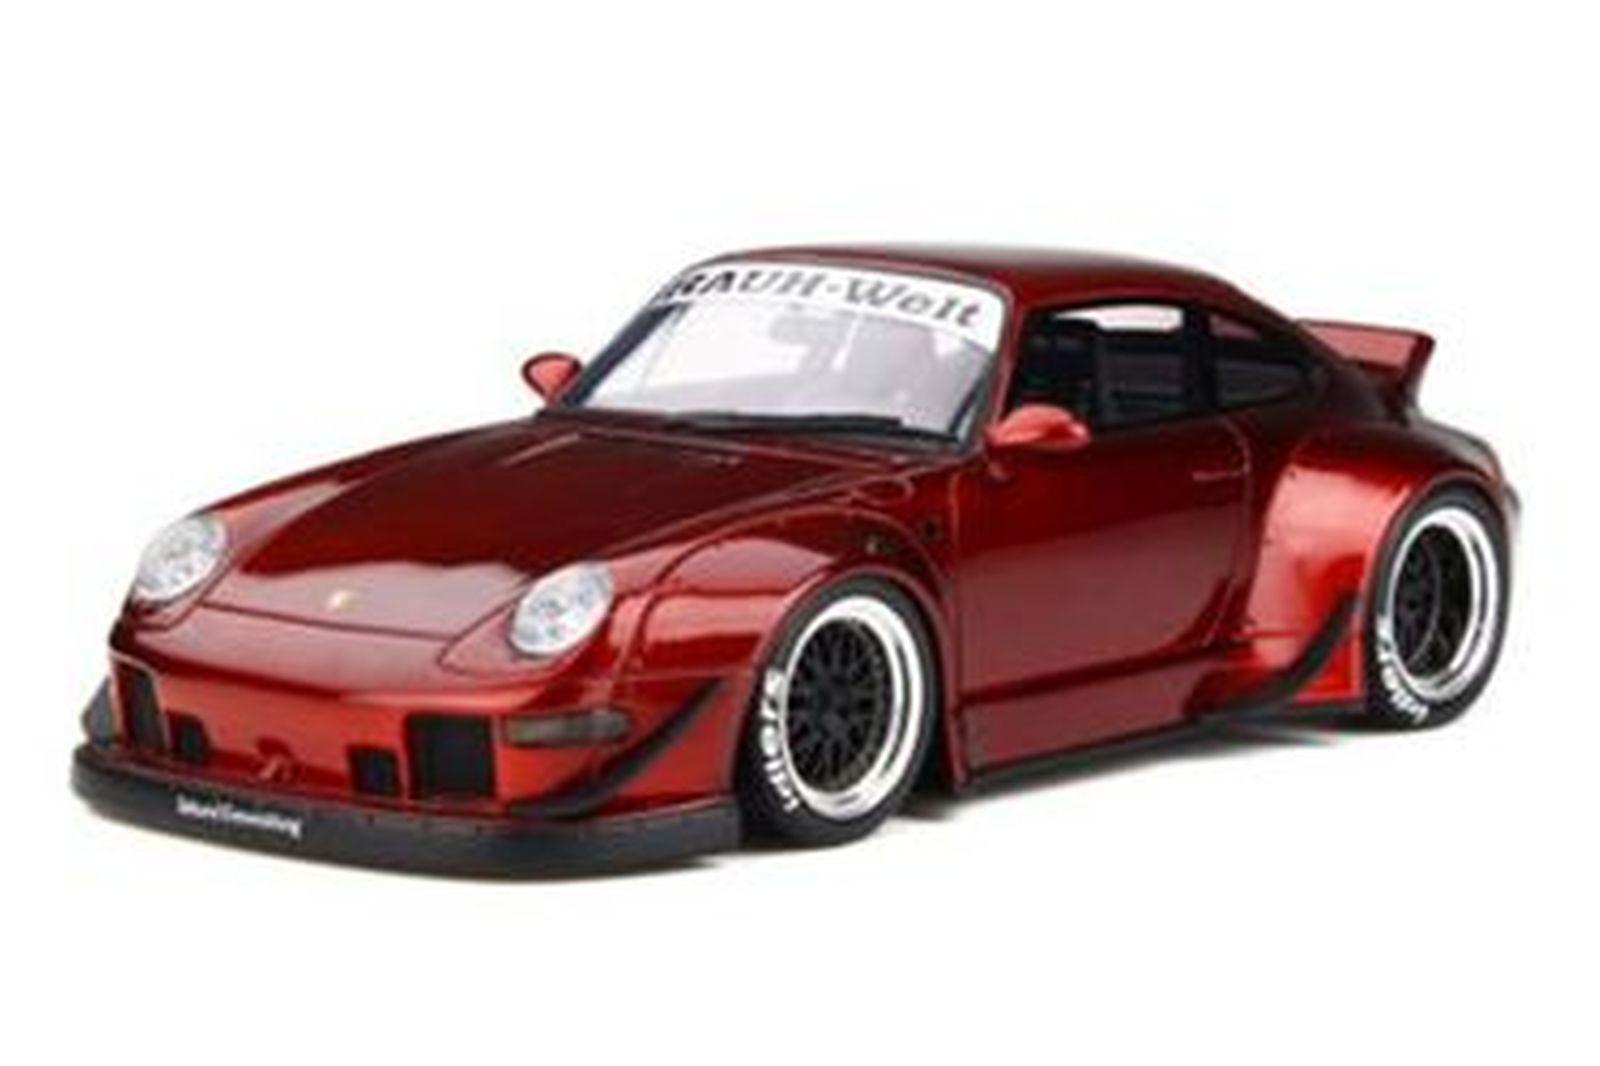 Model Car - Porsche GT759 RWB Duck Tail (Red)  Brand - GT Spirit (Scale -1:18)